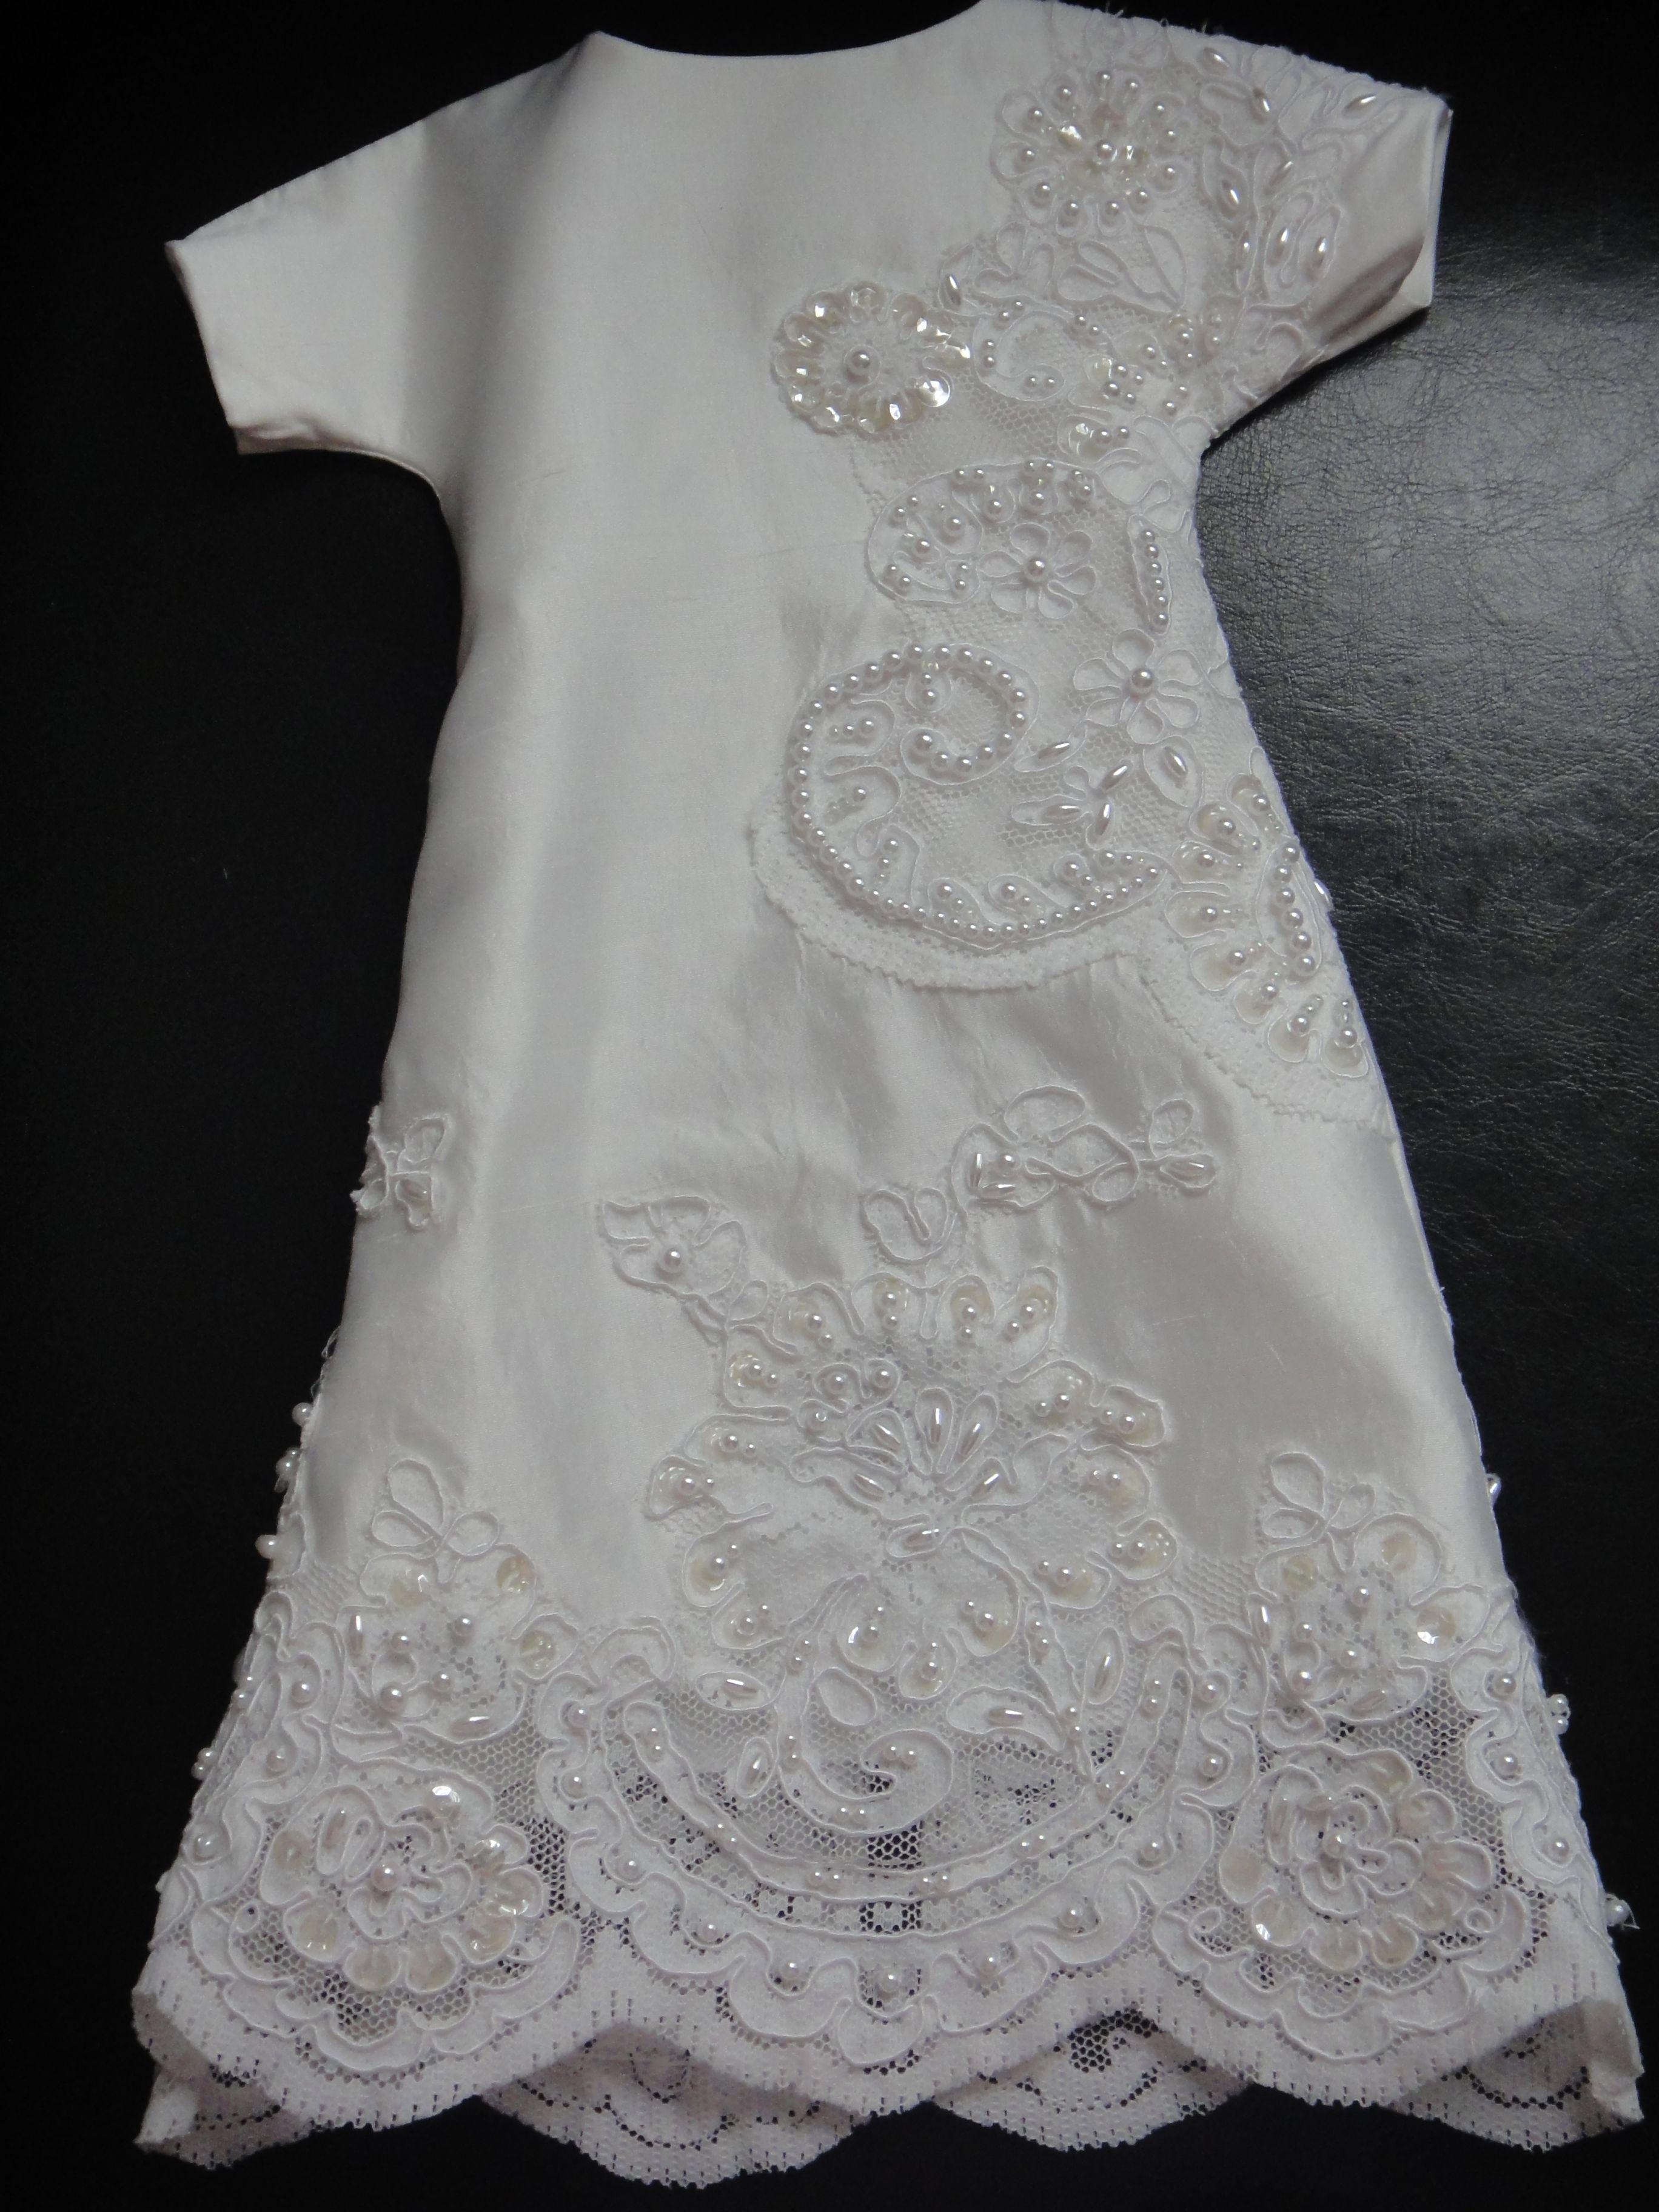 Medium Angel Gown #16 | My Angel Gowns | Pinterest | Angel, Gowns ...